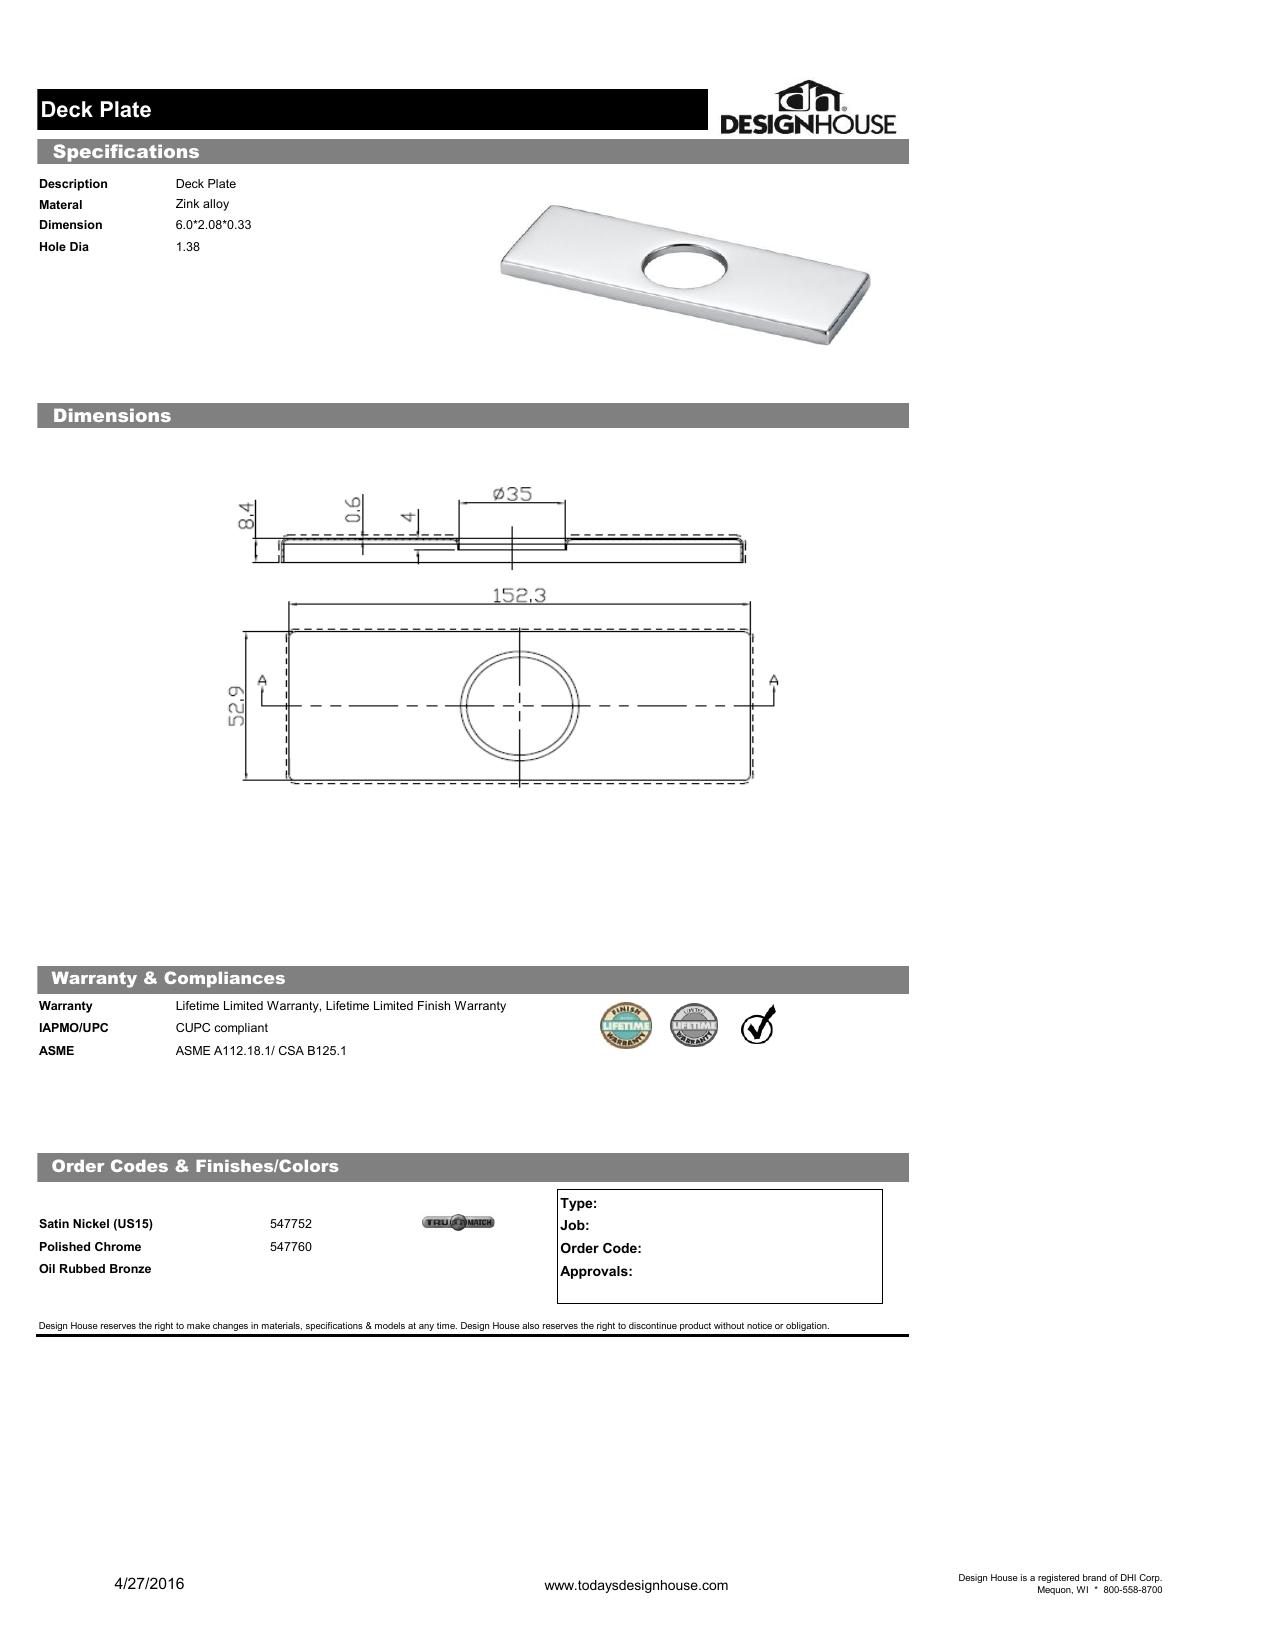 Design House 547760 Deck Plate 6